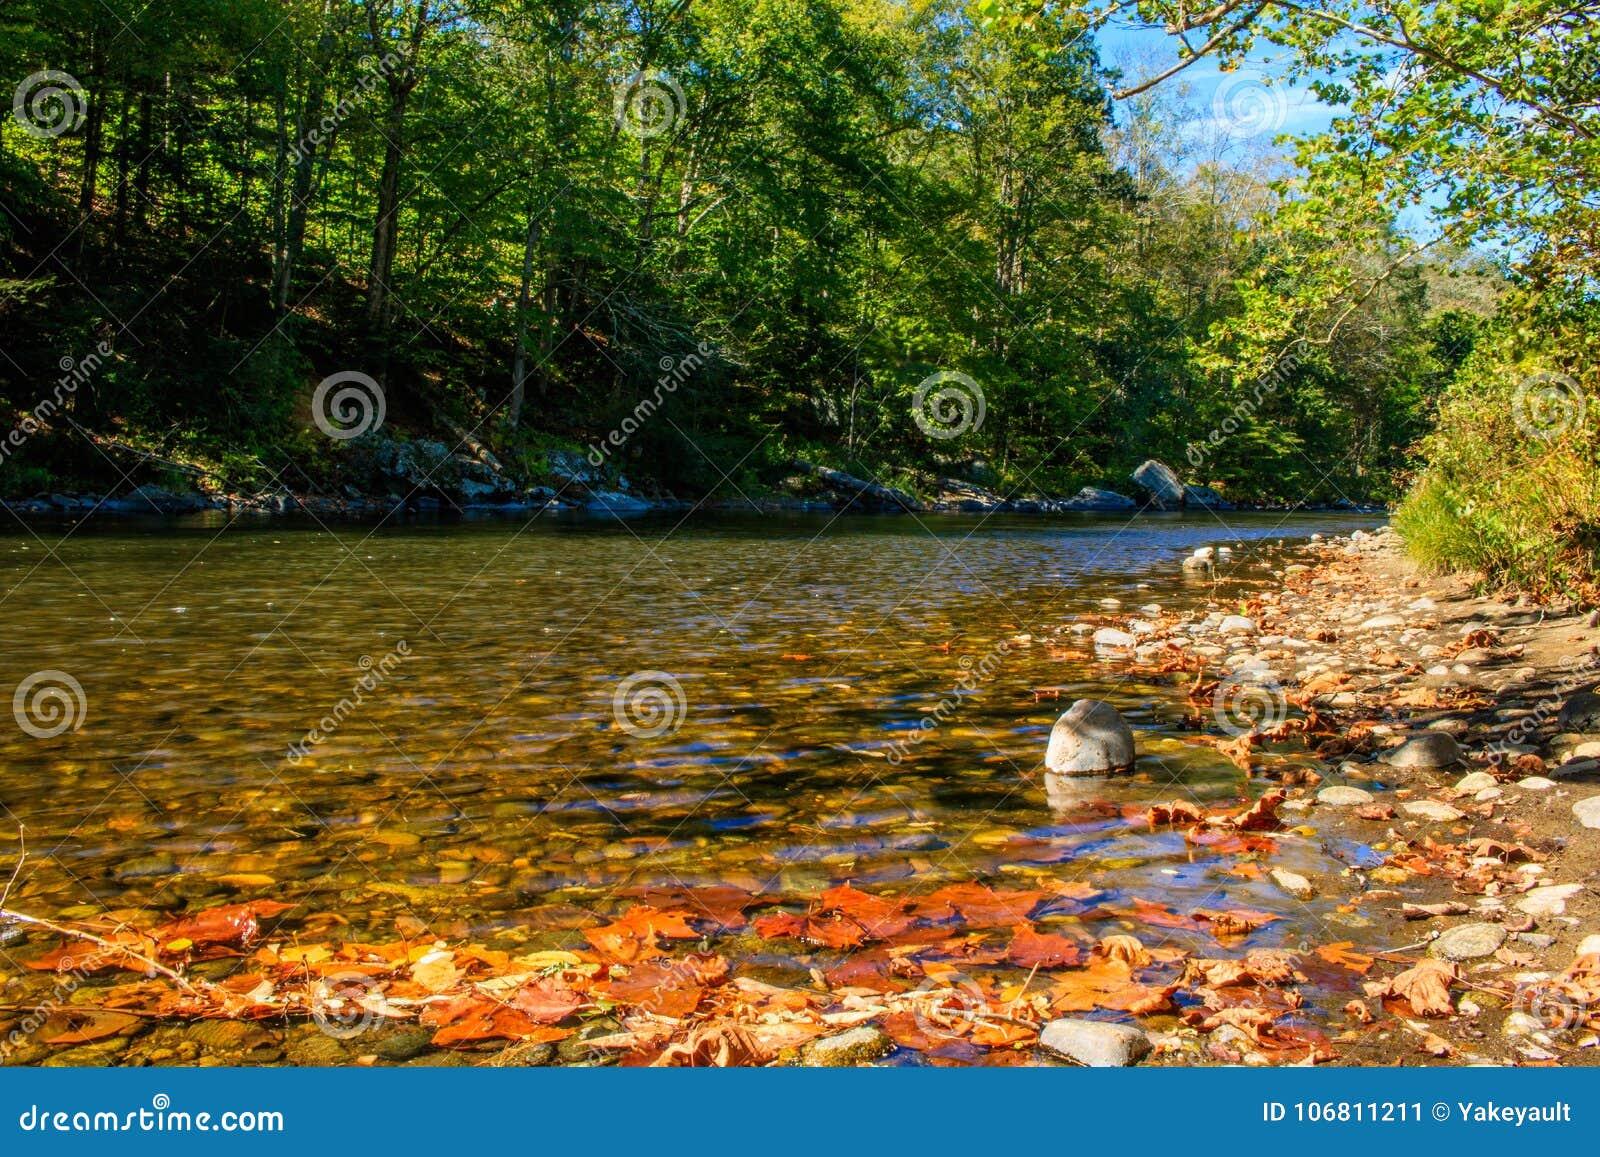 Early fall on the Farmington River